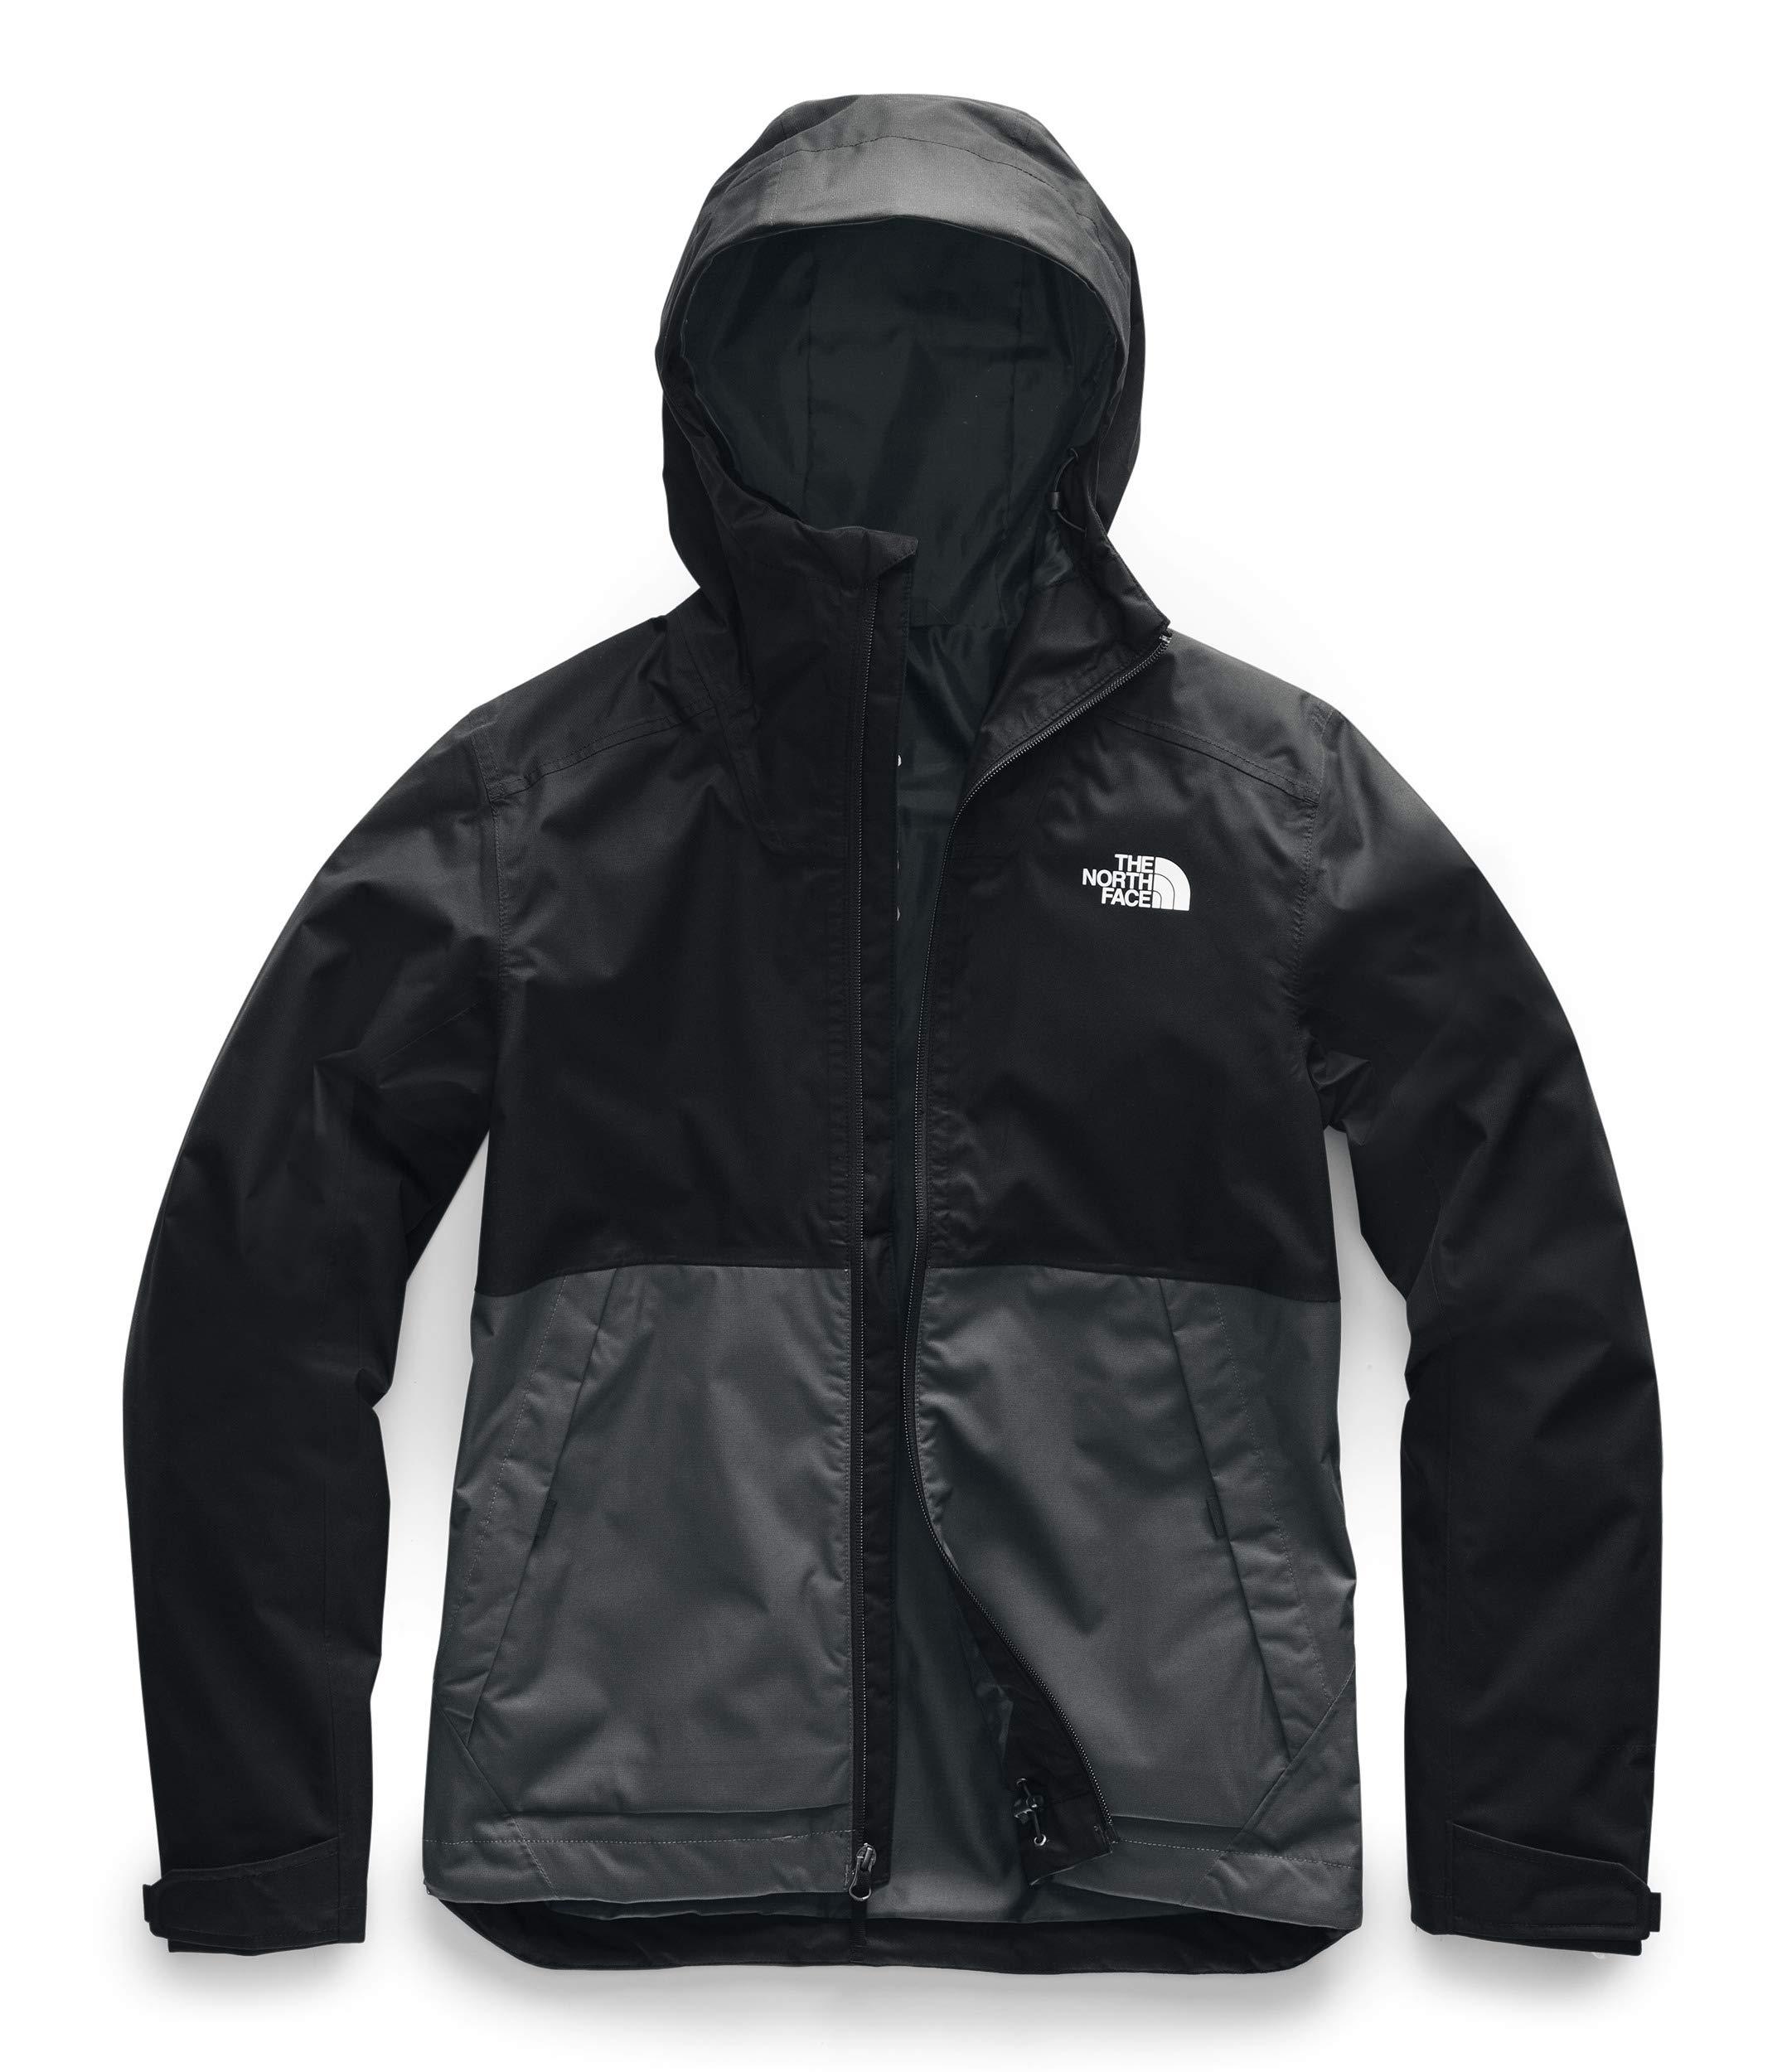 The North Face Men's Millerton Jacket Asphalt Grey by The North Face